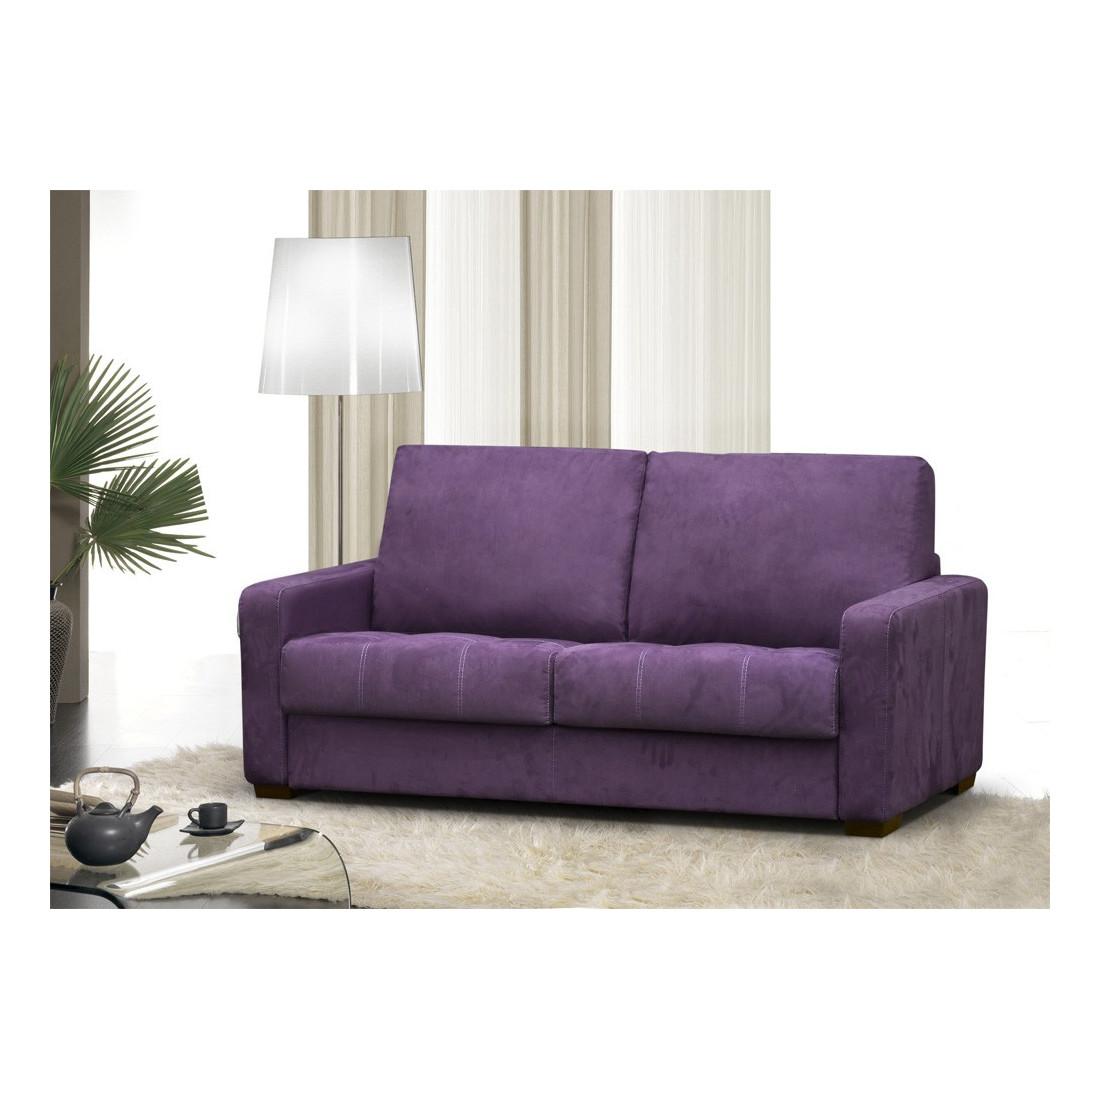 canap convertible 140 cm tibet univers du salon. Black Bedroom Furniture Sets. Home Design Ideas